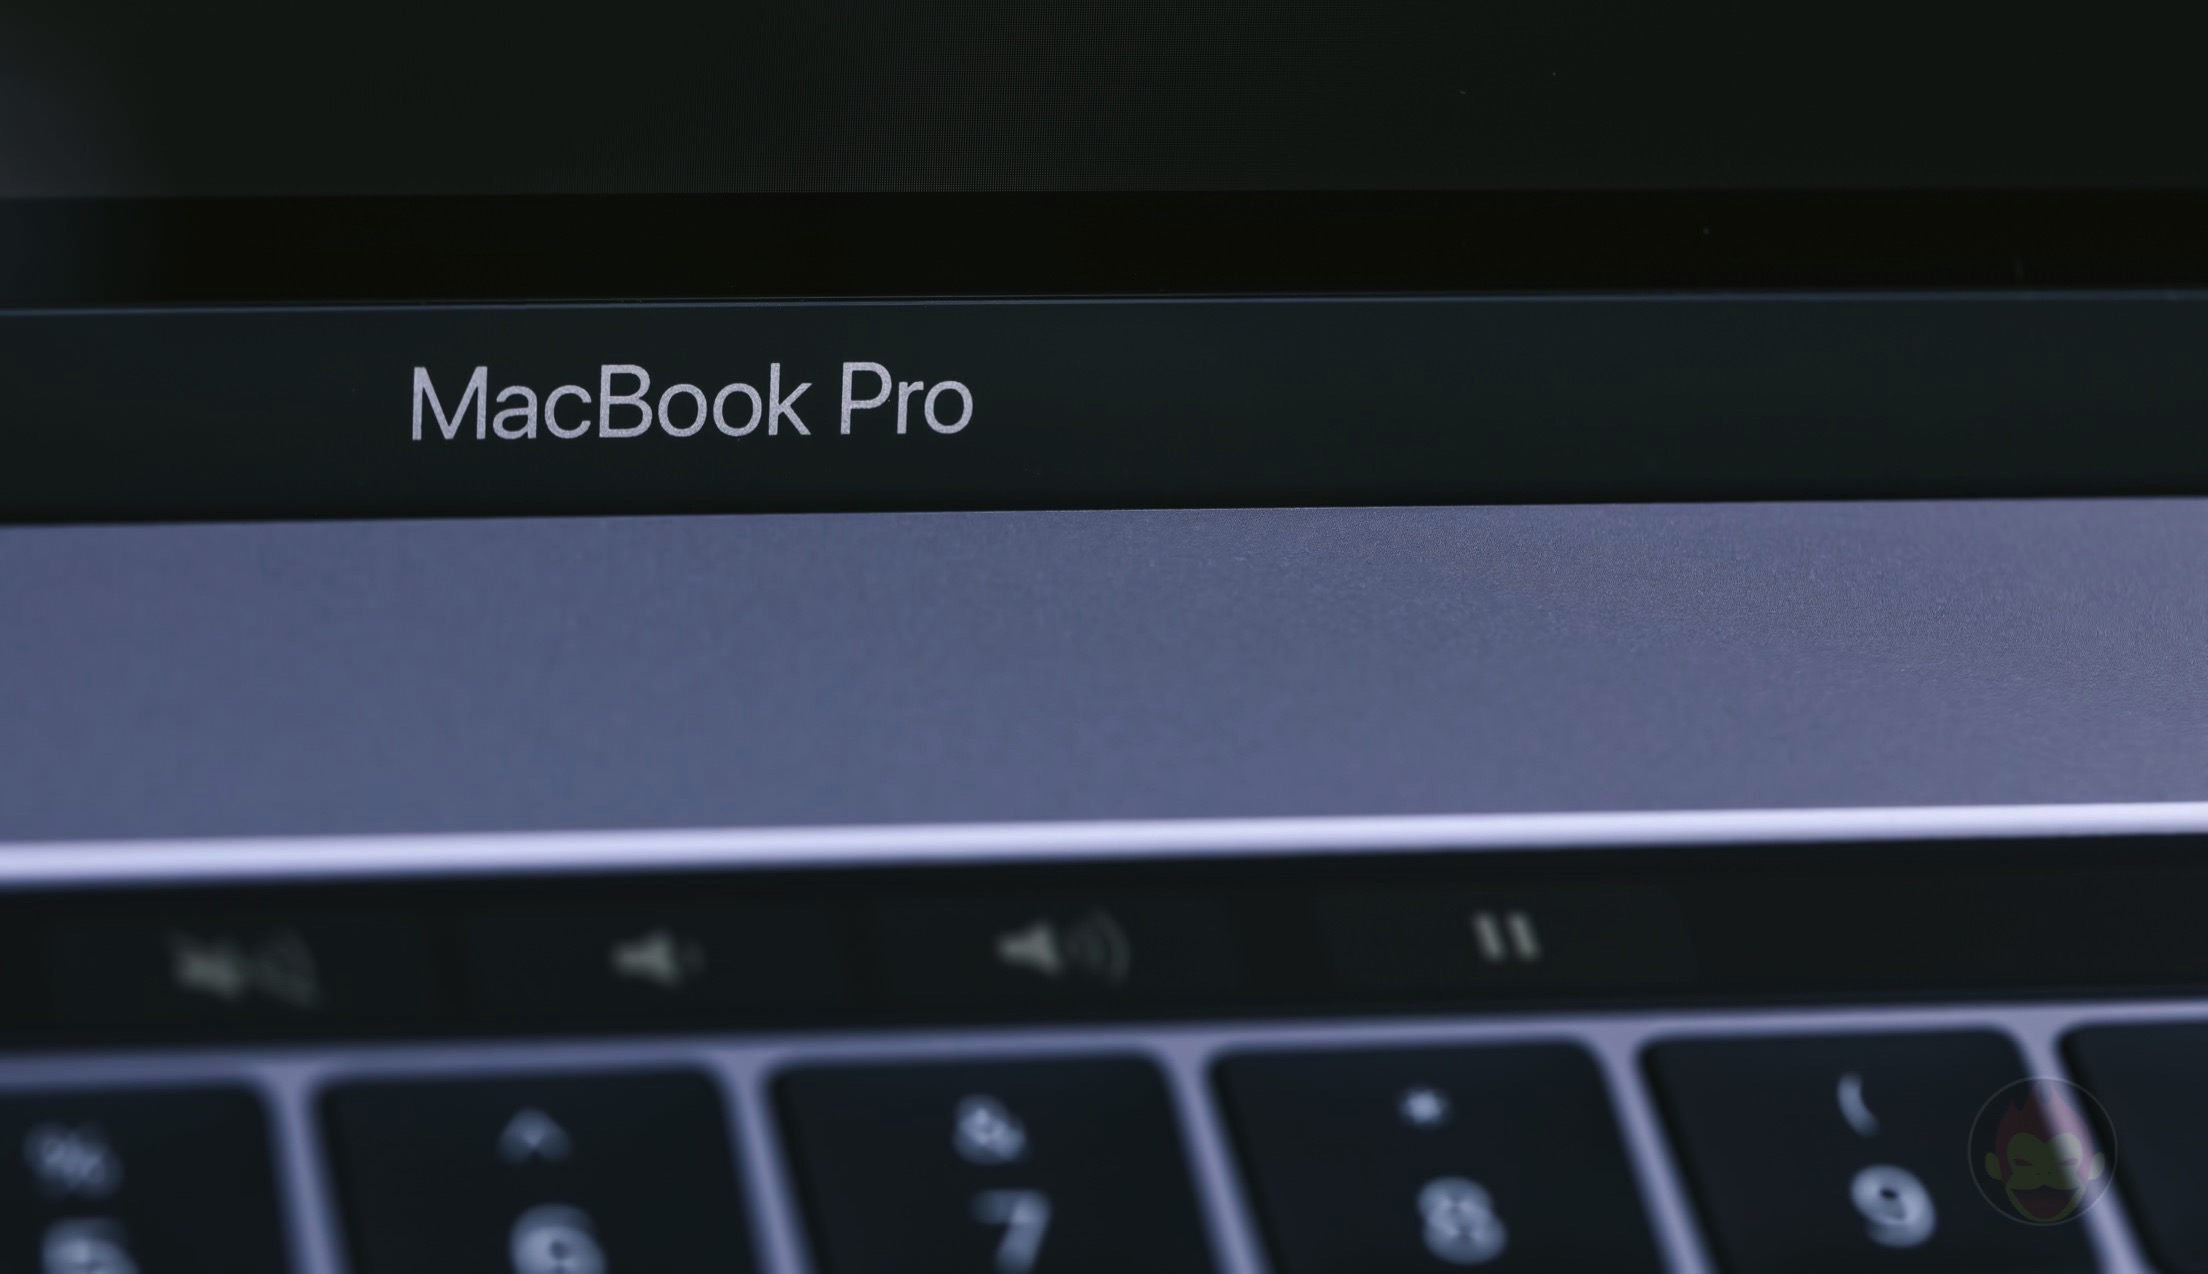 MacBook-Pro-Late2016-15inch-Model-Trackpad-02.jpg